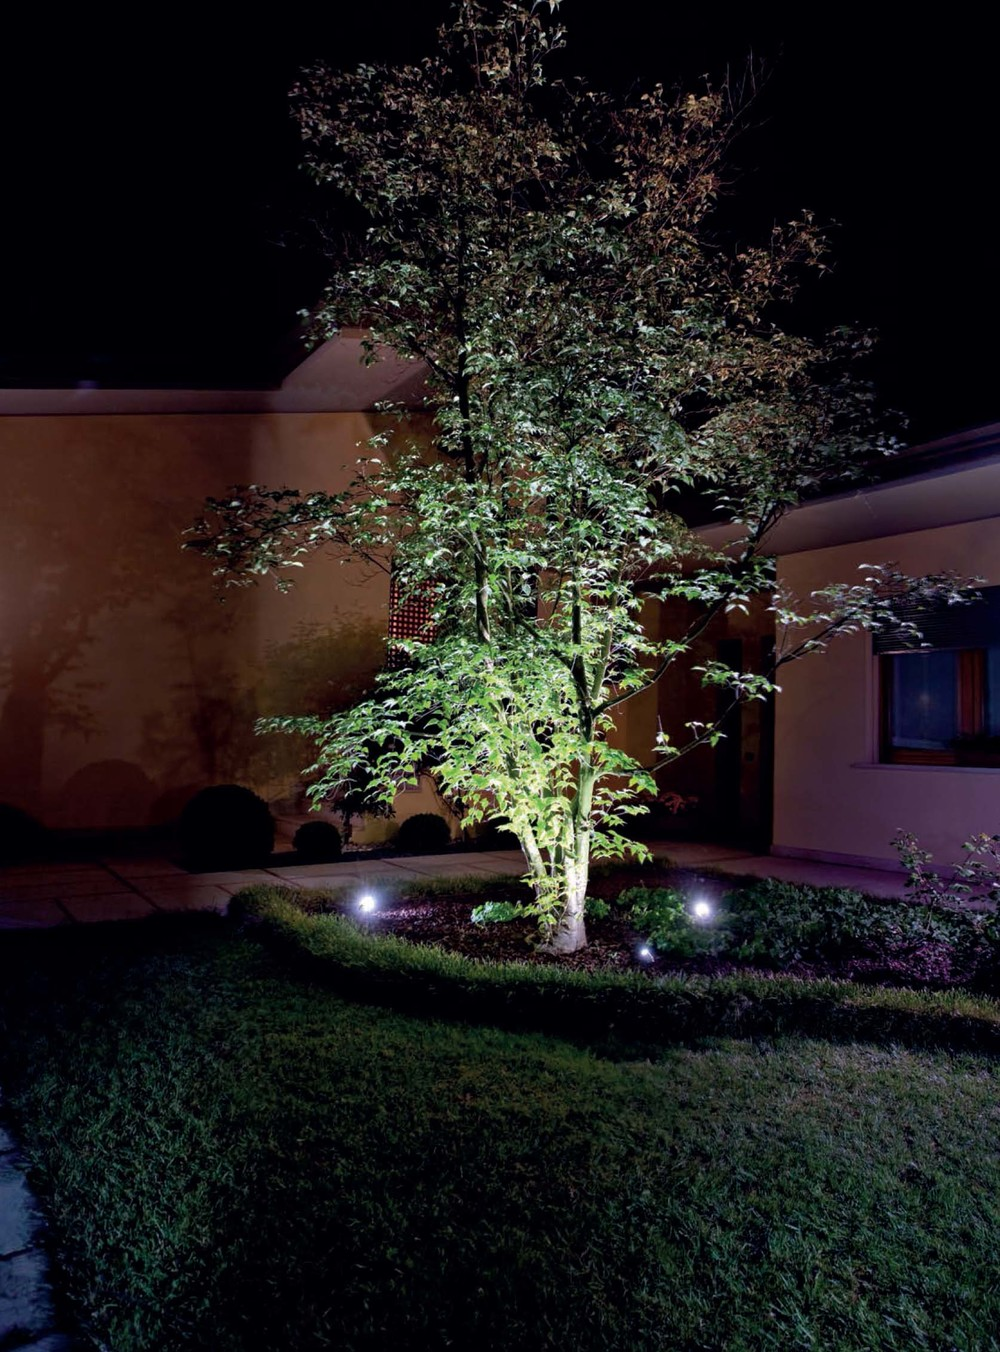 Landscape and garden lighting lighting solutions for Residential outdoor lighting